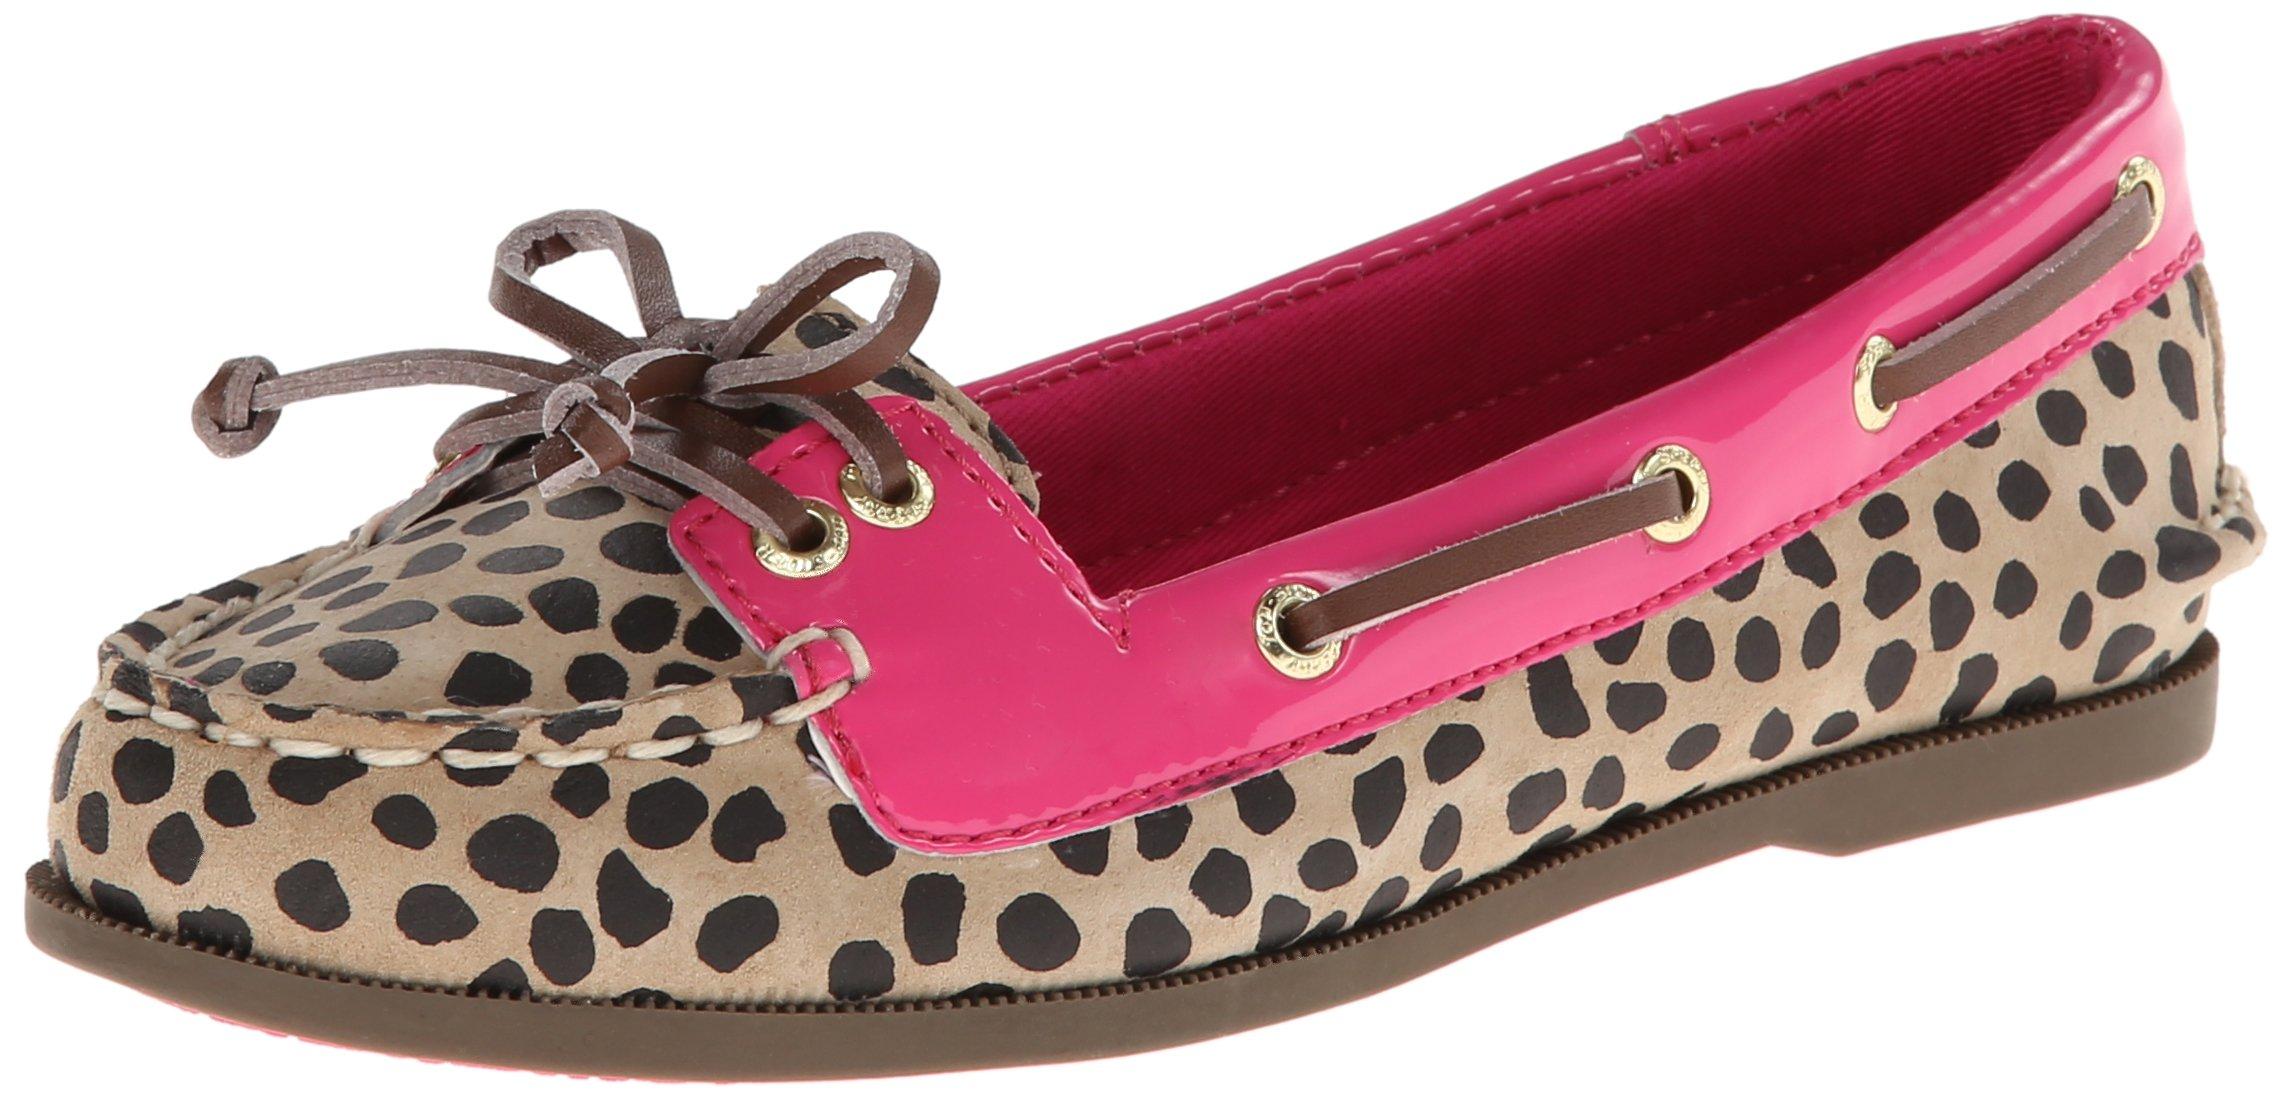 Sperry Top-Sider Audrey YG Boat Shoe (Little Kid/Big Kid),Leopard/Pink,2.5 M US Little Kid